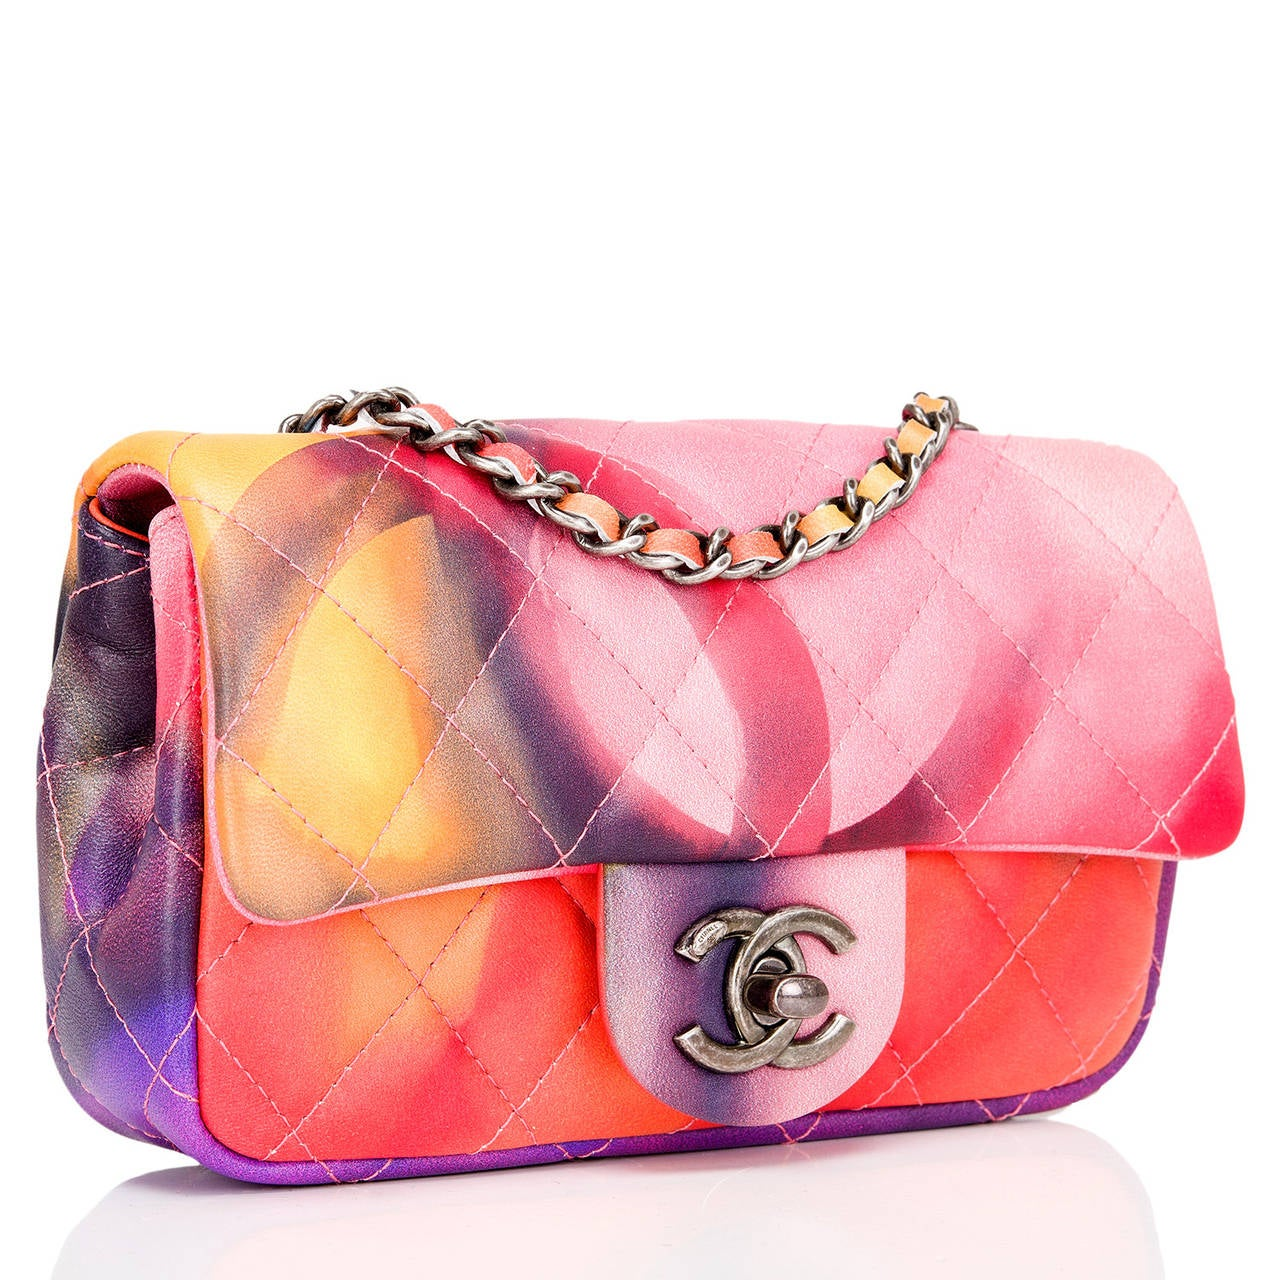 Chanel Flower Power Mini Flap Bag At 1stdibs